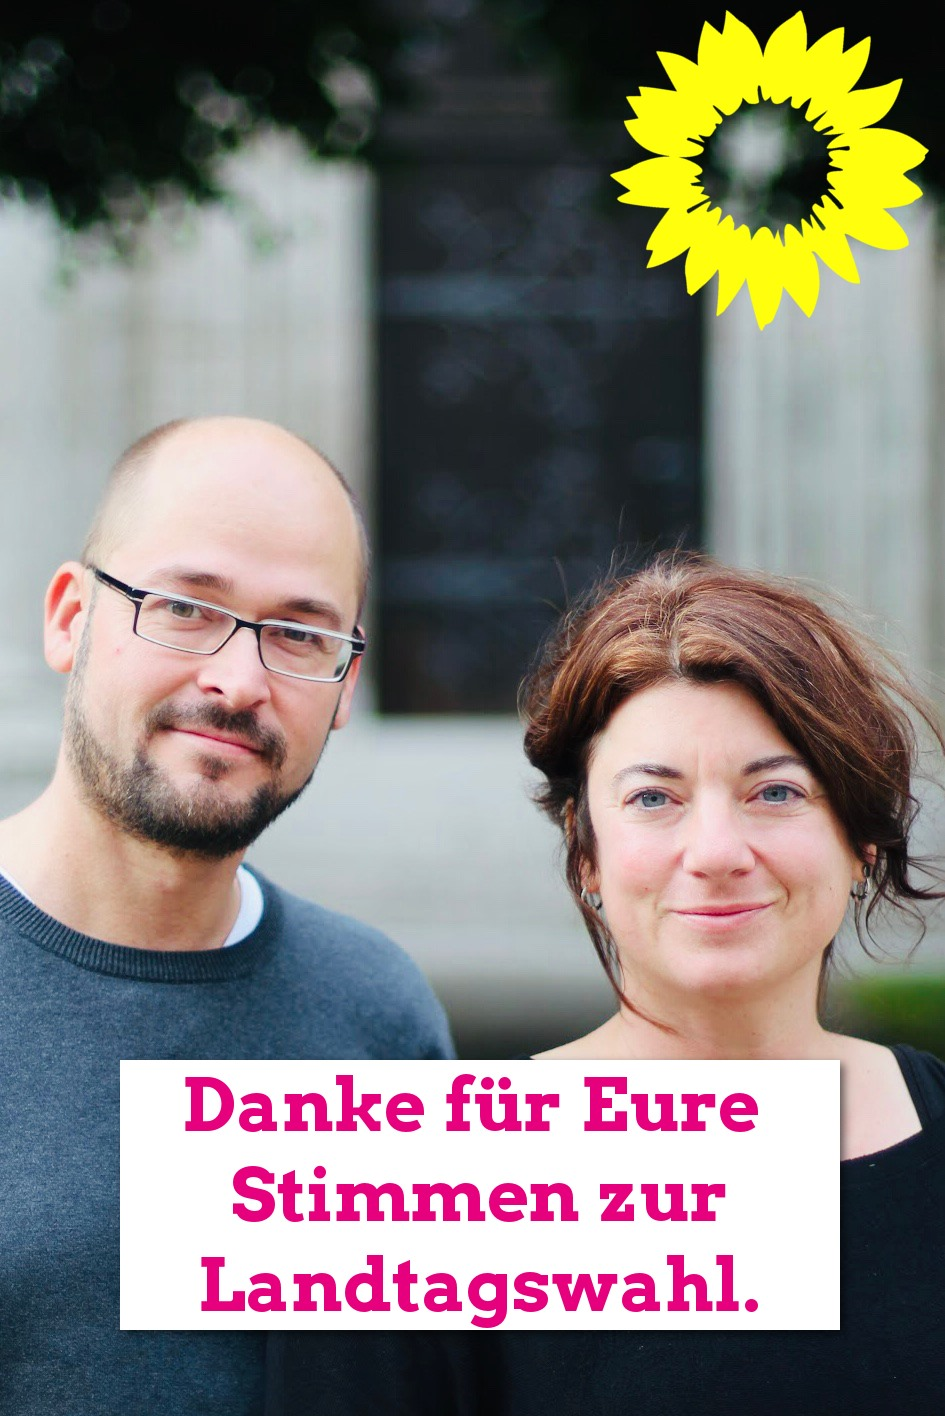 Landtagswahlen in Thüringen – Knapper als erwartet!